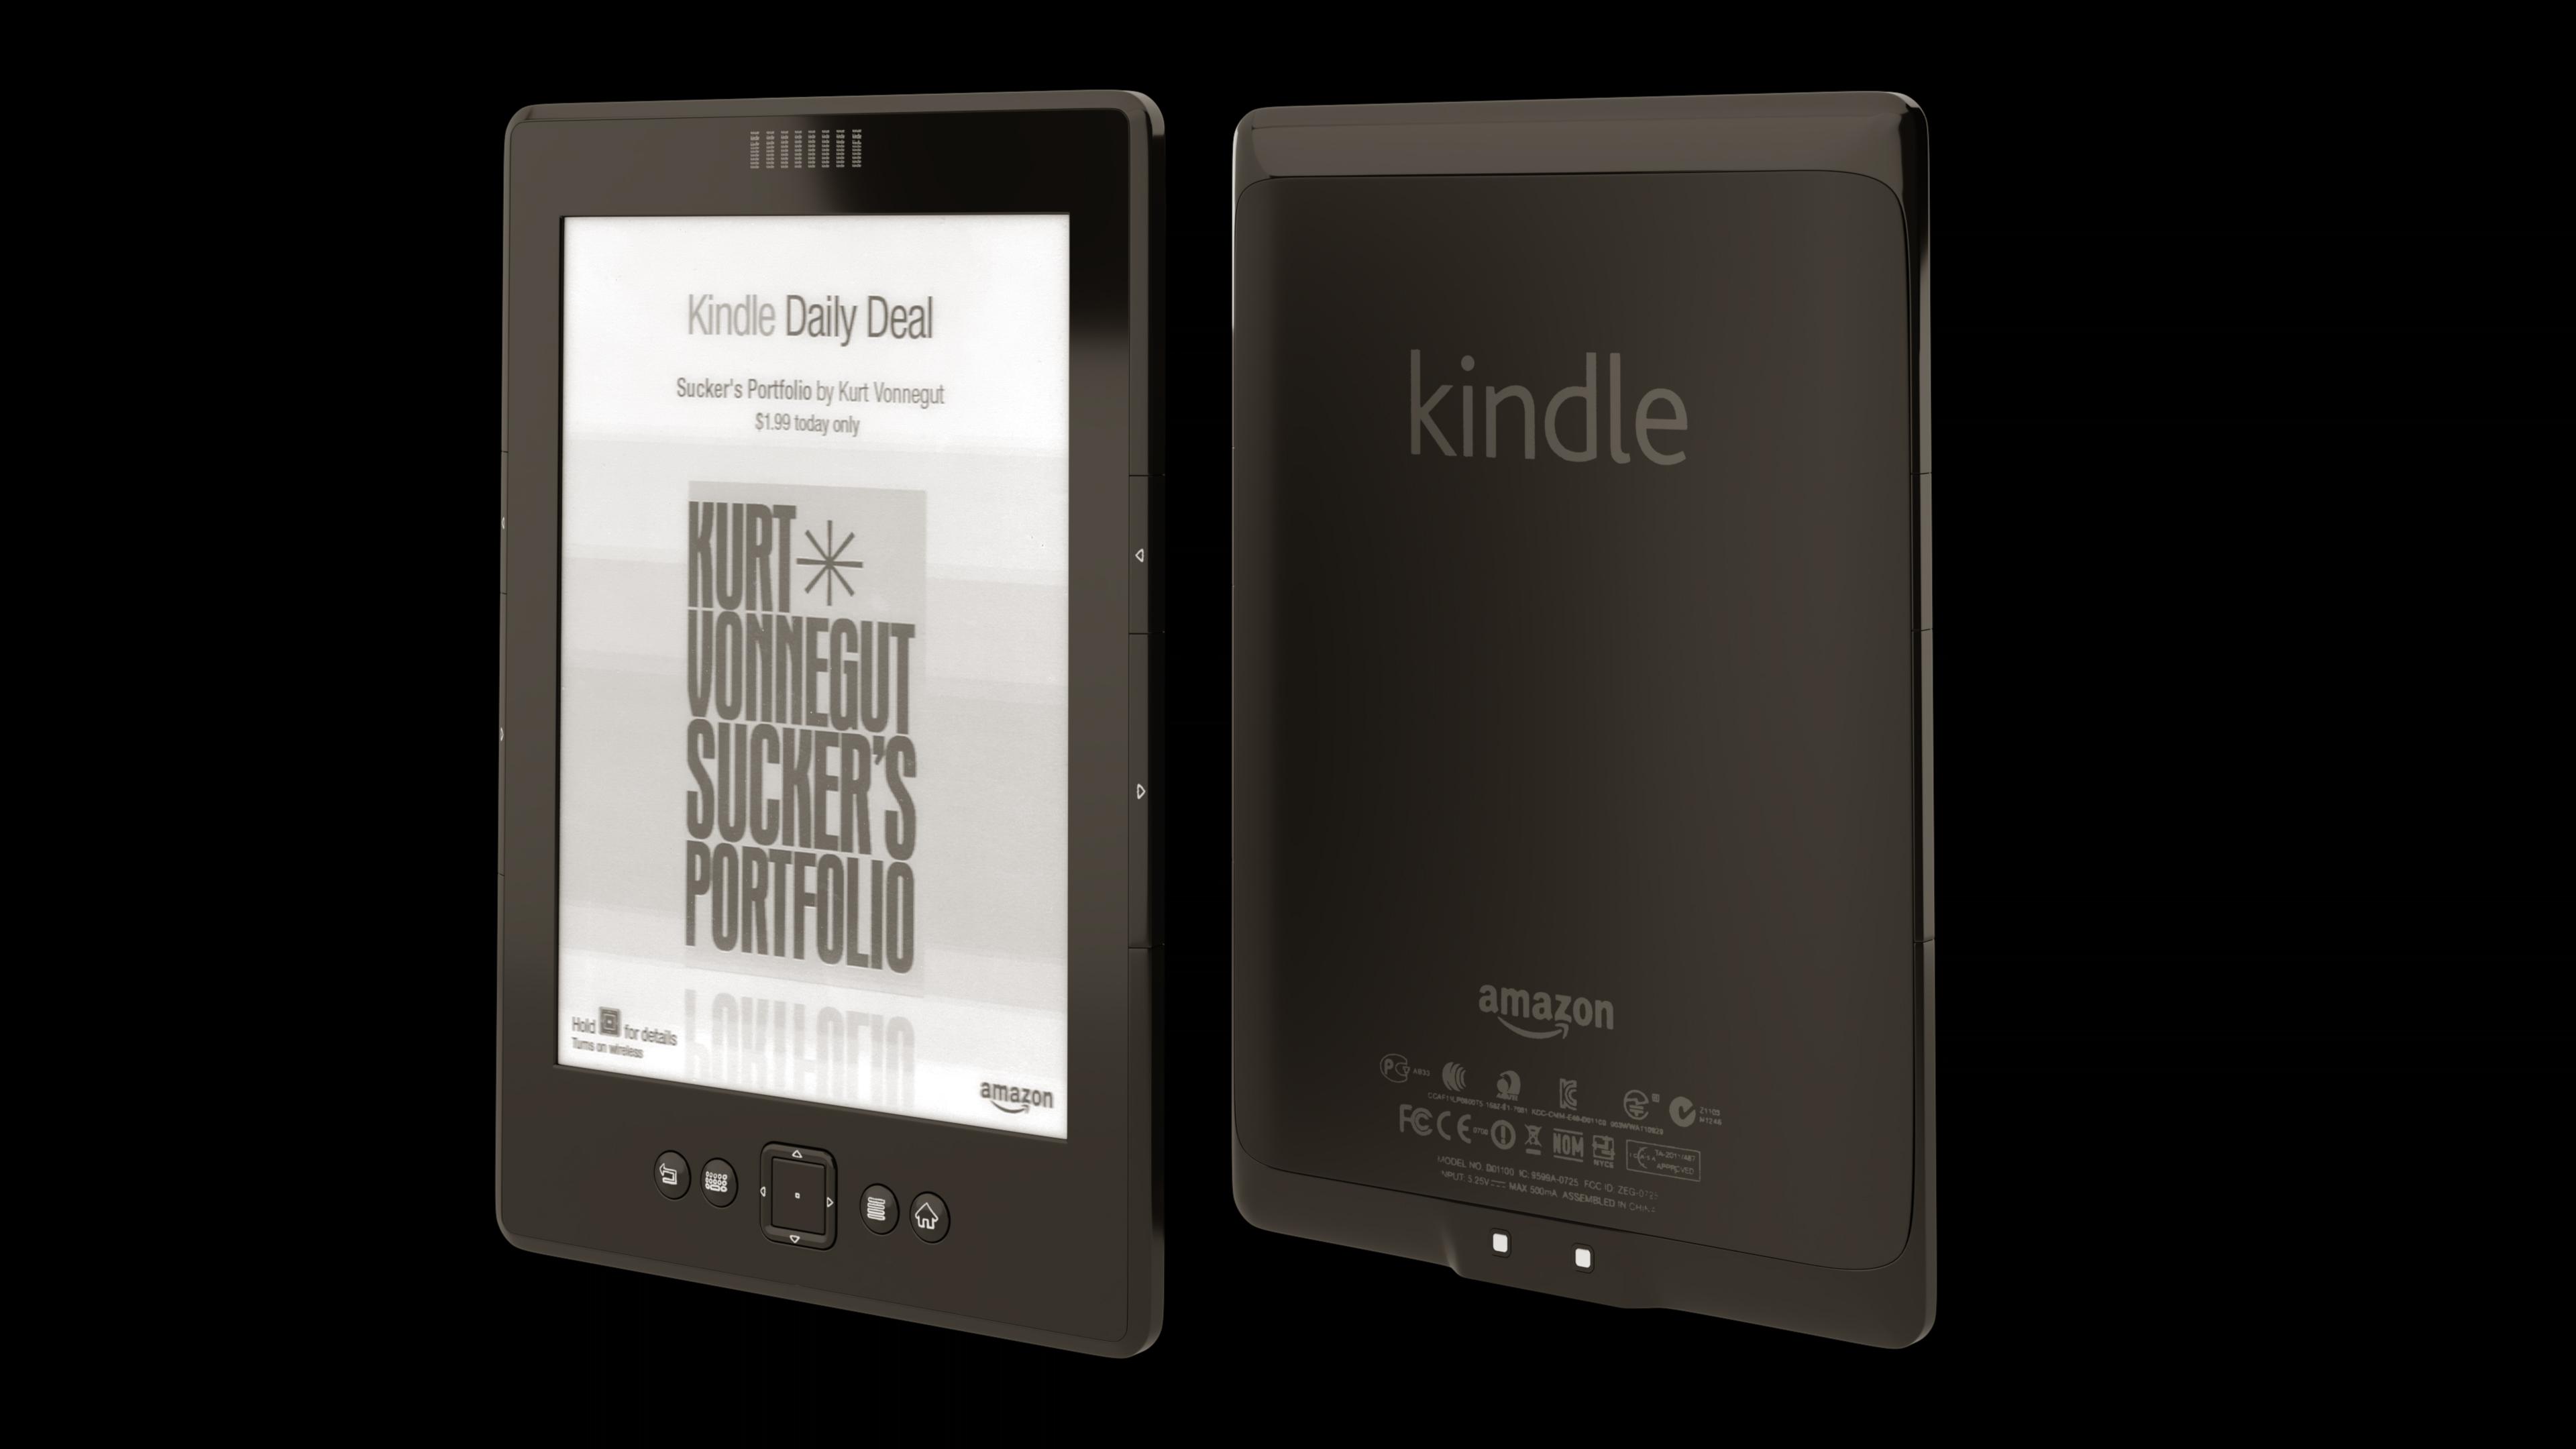 Kindle_Amazon_render_3d_002